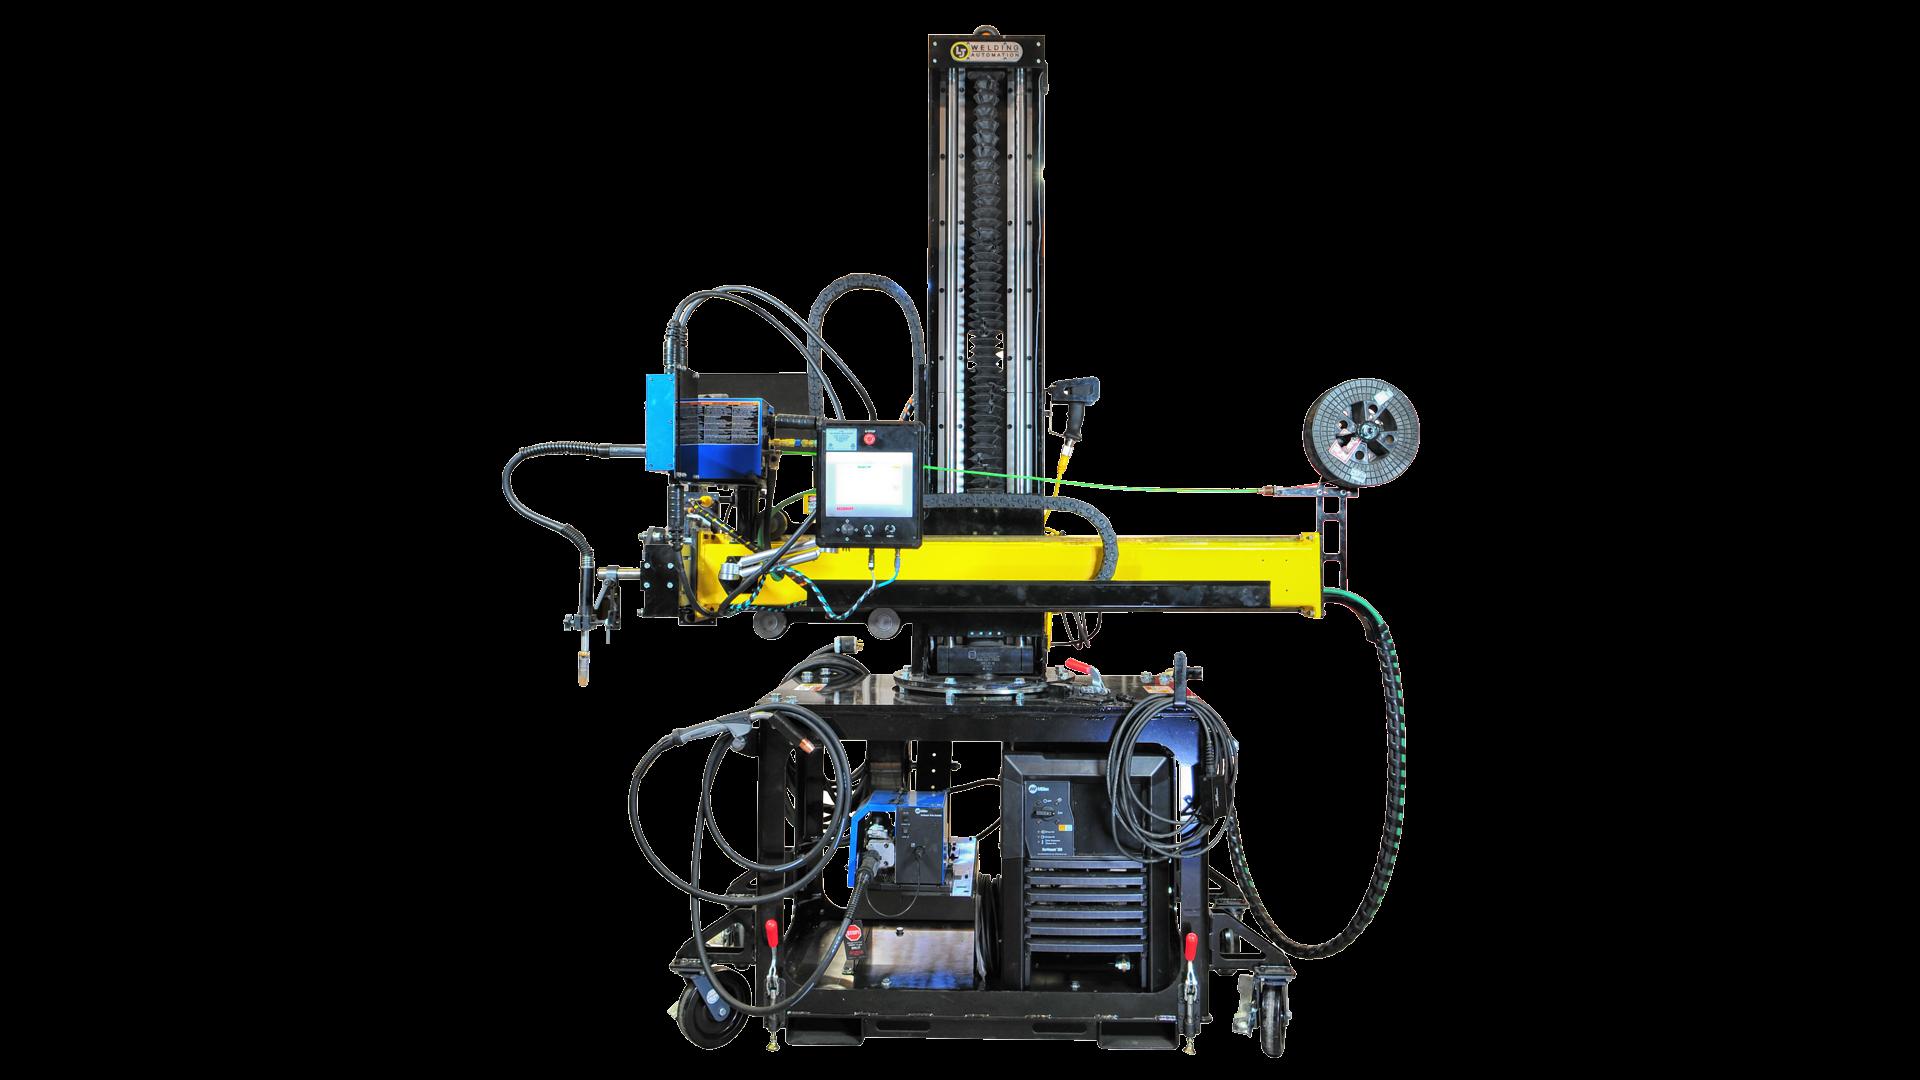 portable welding manipulator 4' x 4'